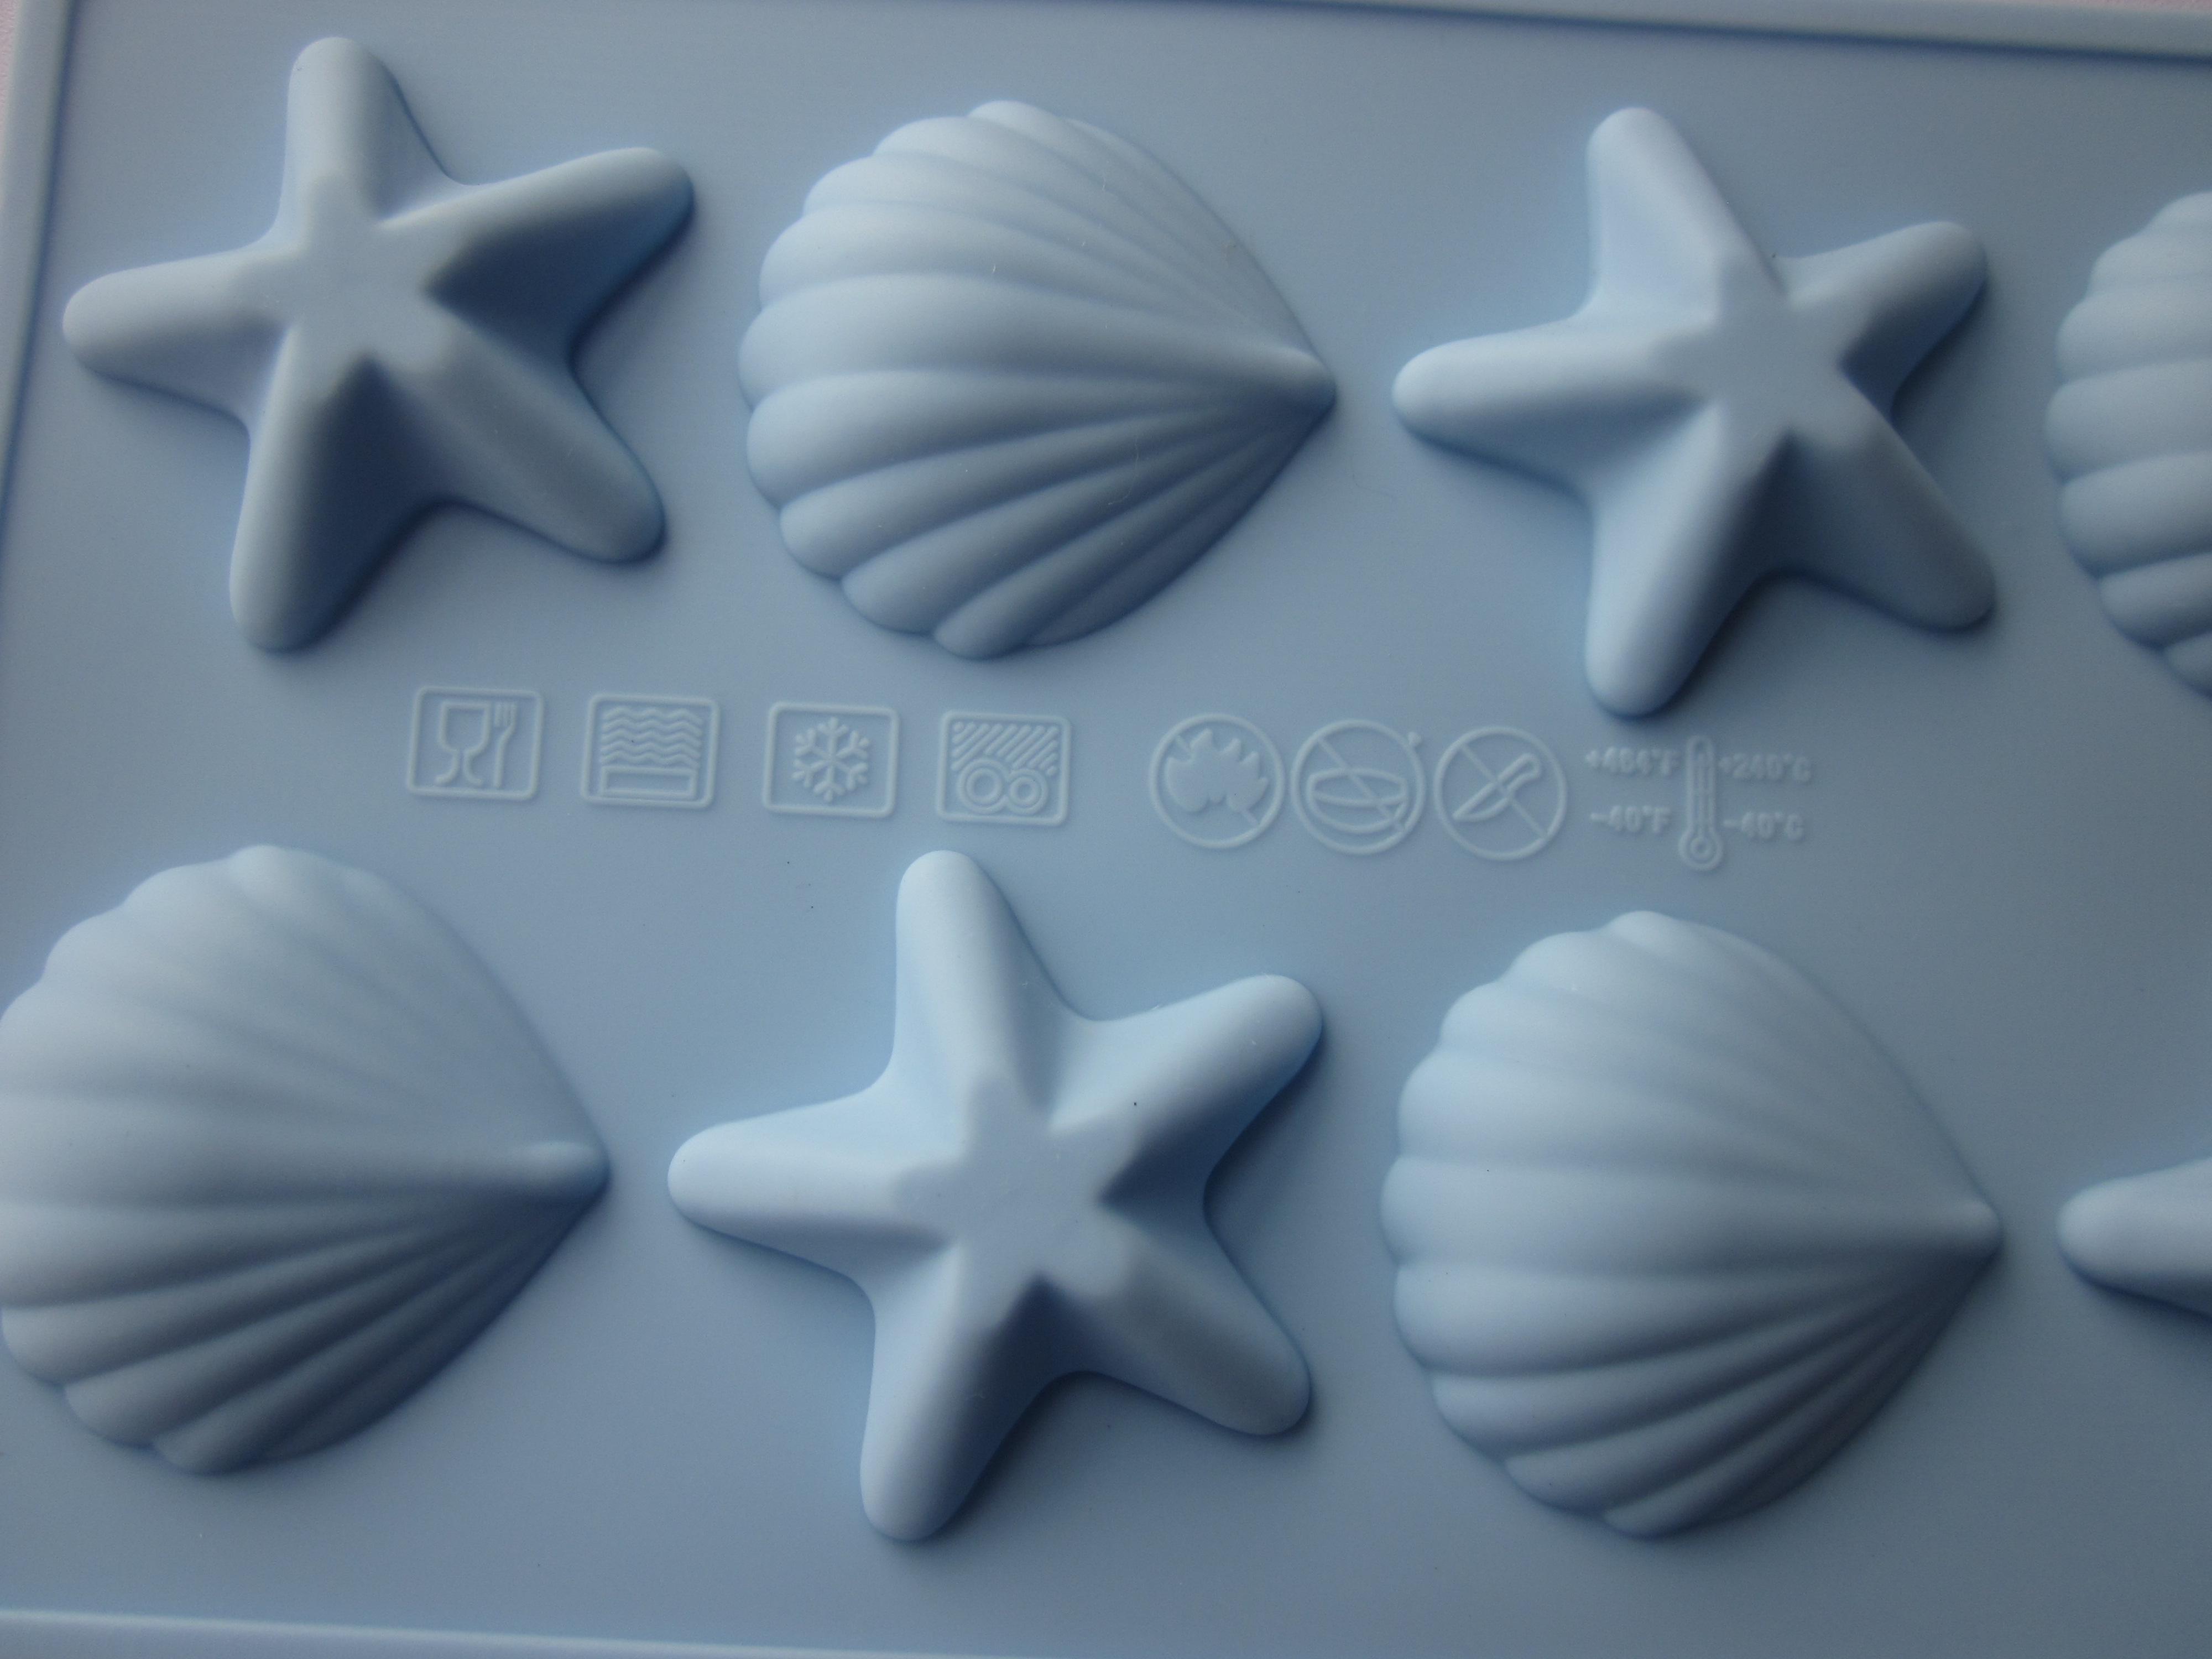 20 st / parti 100% silikongummi silikonkaka mögel / silikon choklad mögel / spirande mögel / gelé mögel / tårta verktyg / matlagning verktyg + gratis frakt